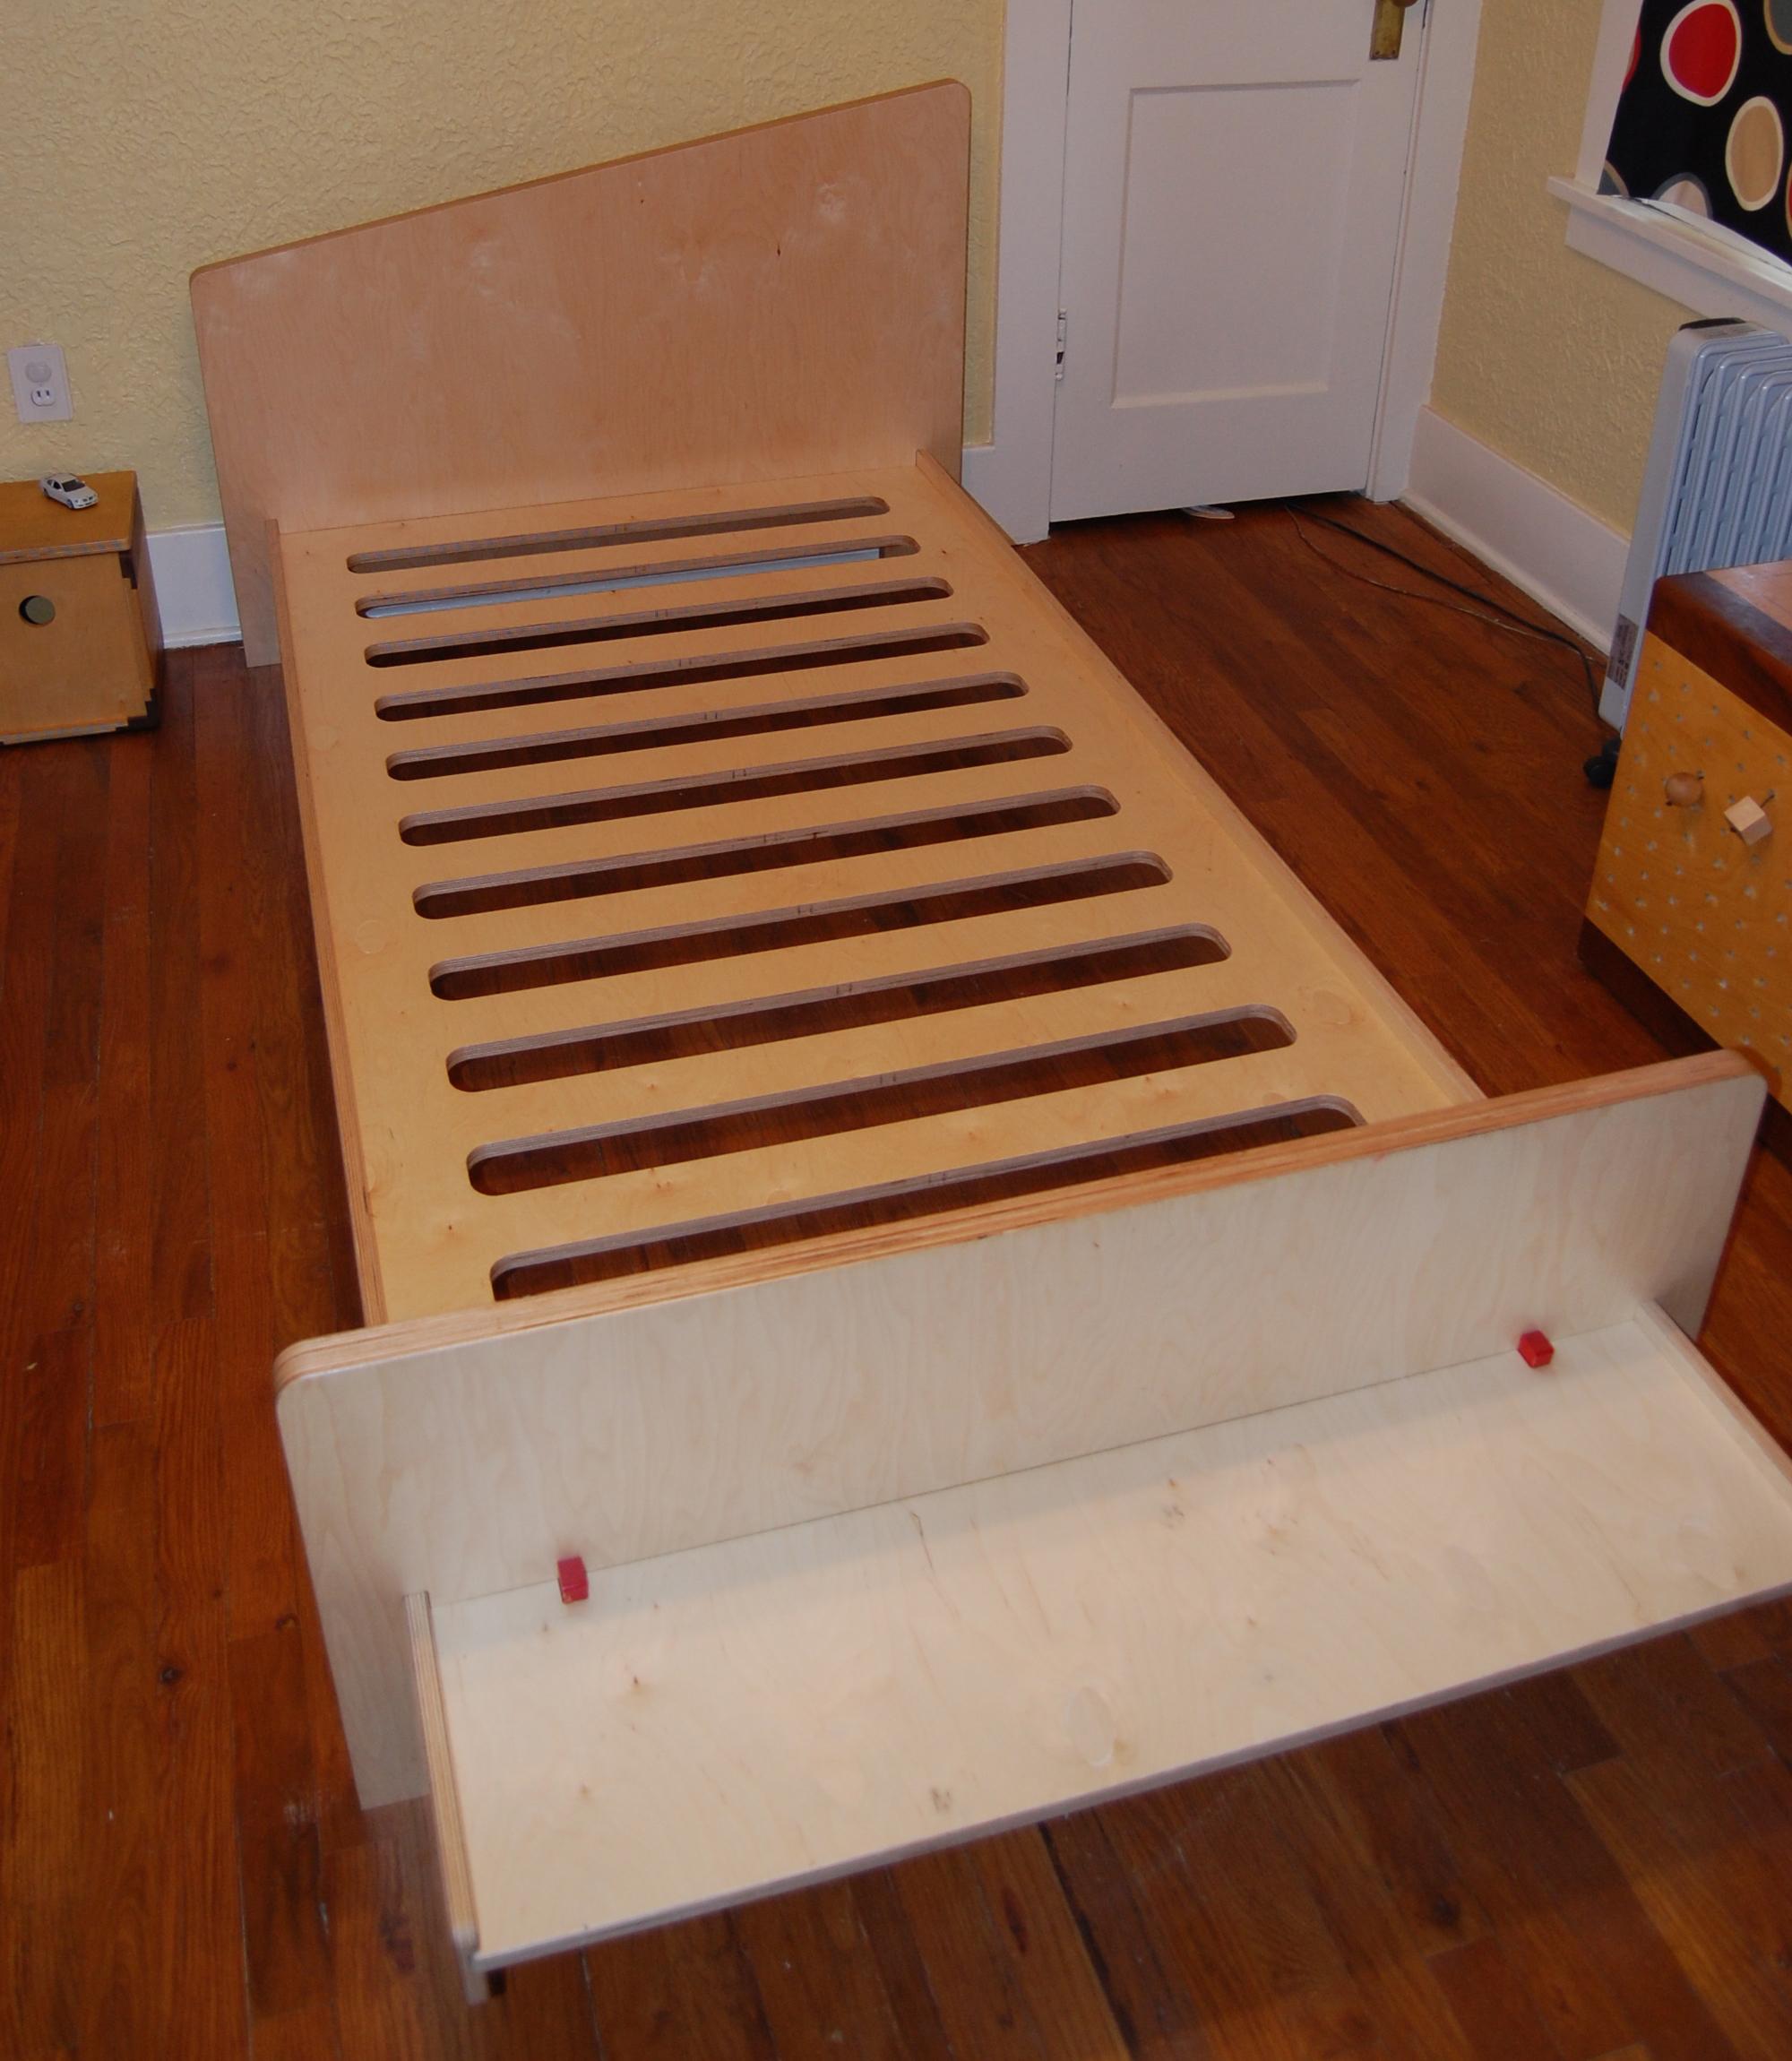 GMO bed frame